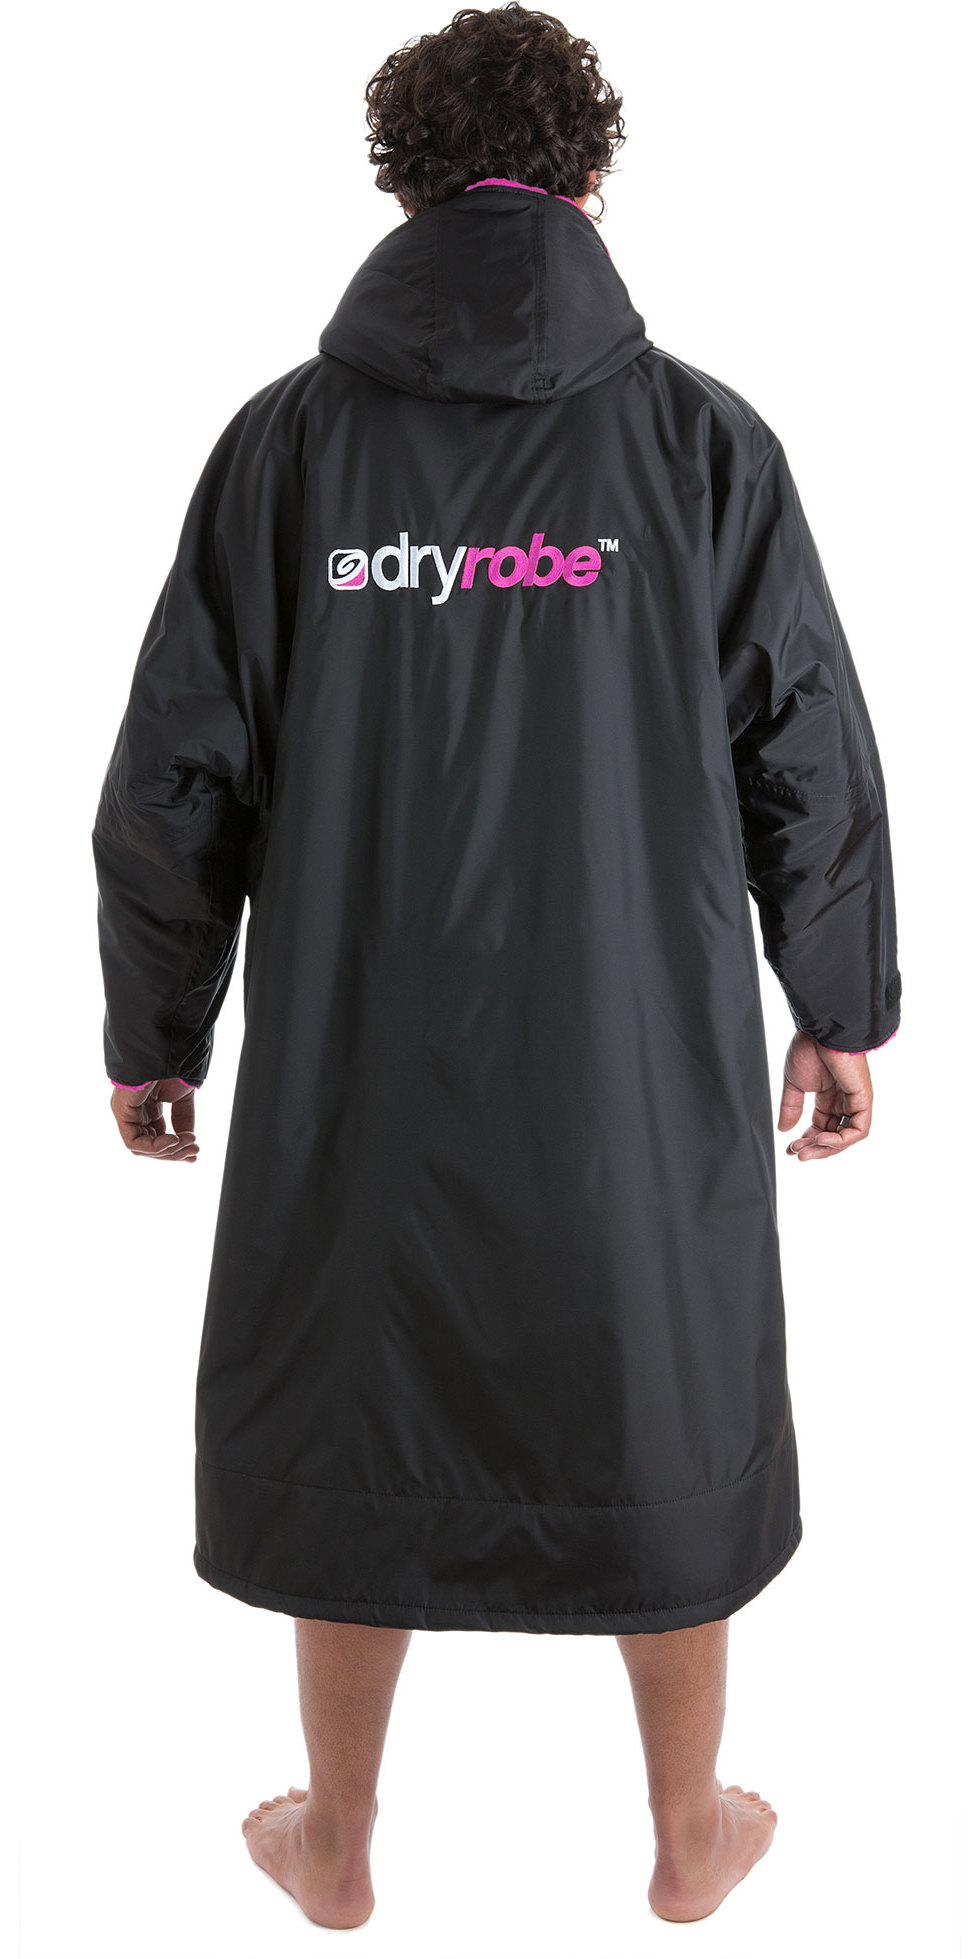 2019 Dryrobe Advance Long Sleeve Premium Outdoor Change Robe / Poncho DR104 Black / Pink